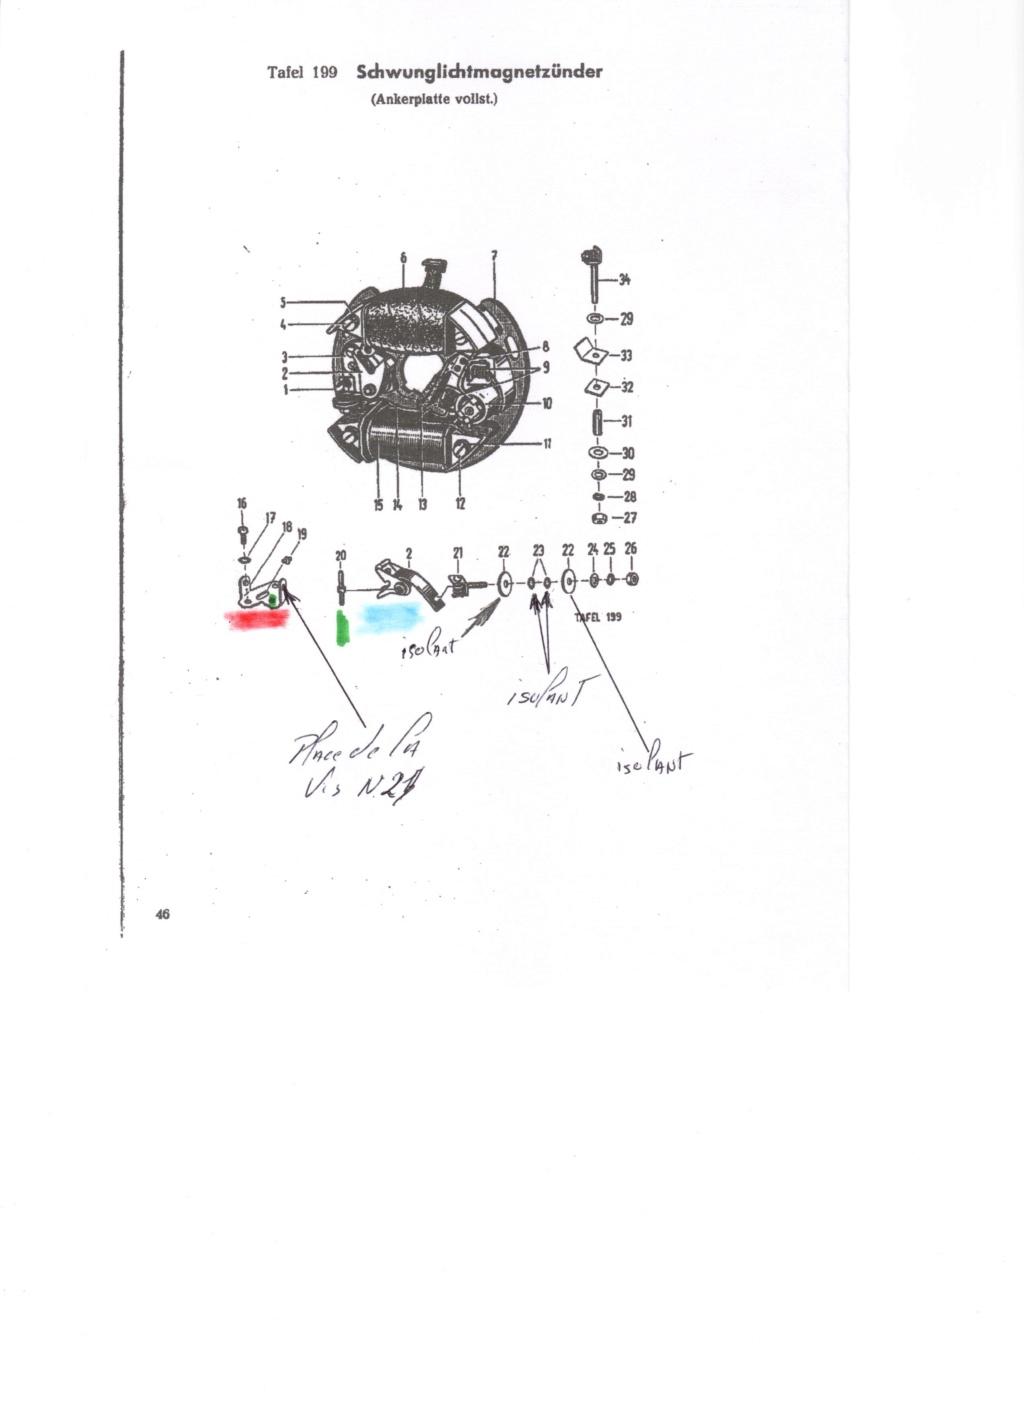 problème allumage Agria 2600 RL - Page 2 Platea11